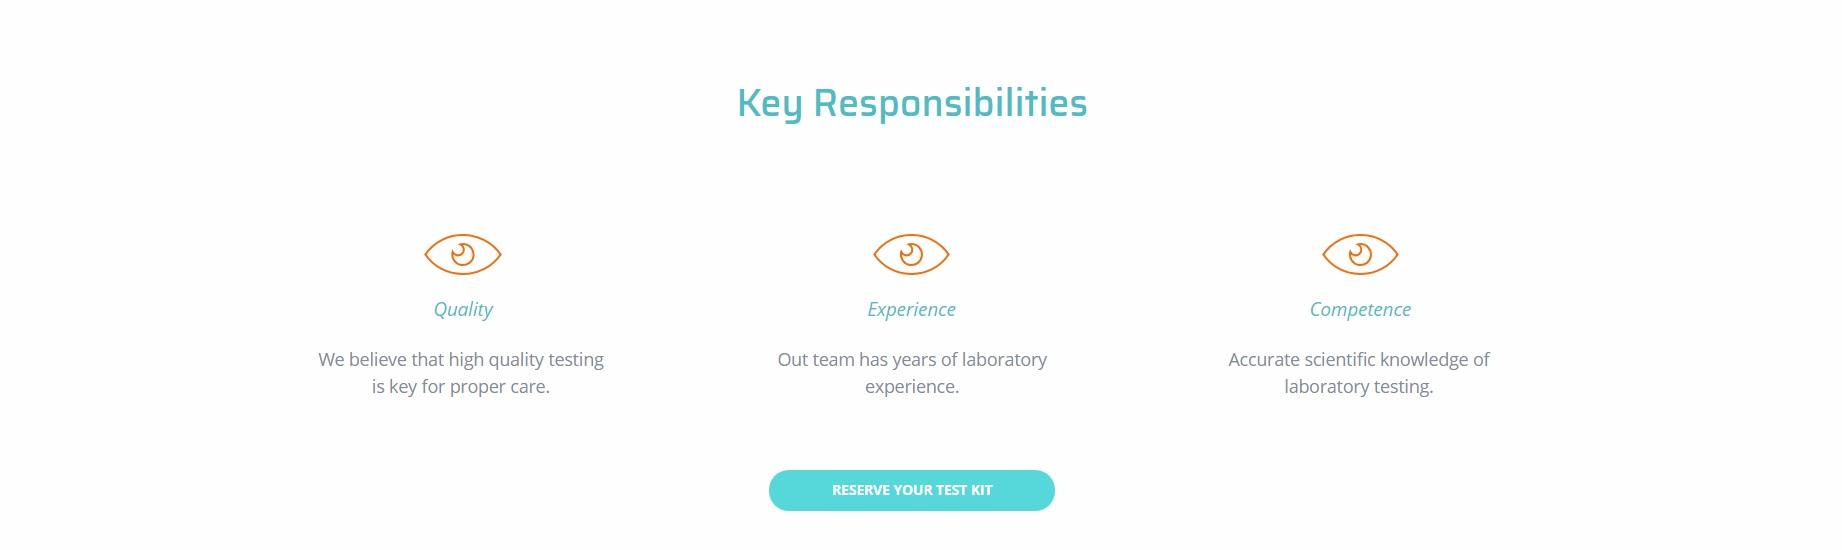 Infectolab Americas - Lyme Advise Key Responsibilities.jpg